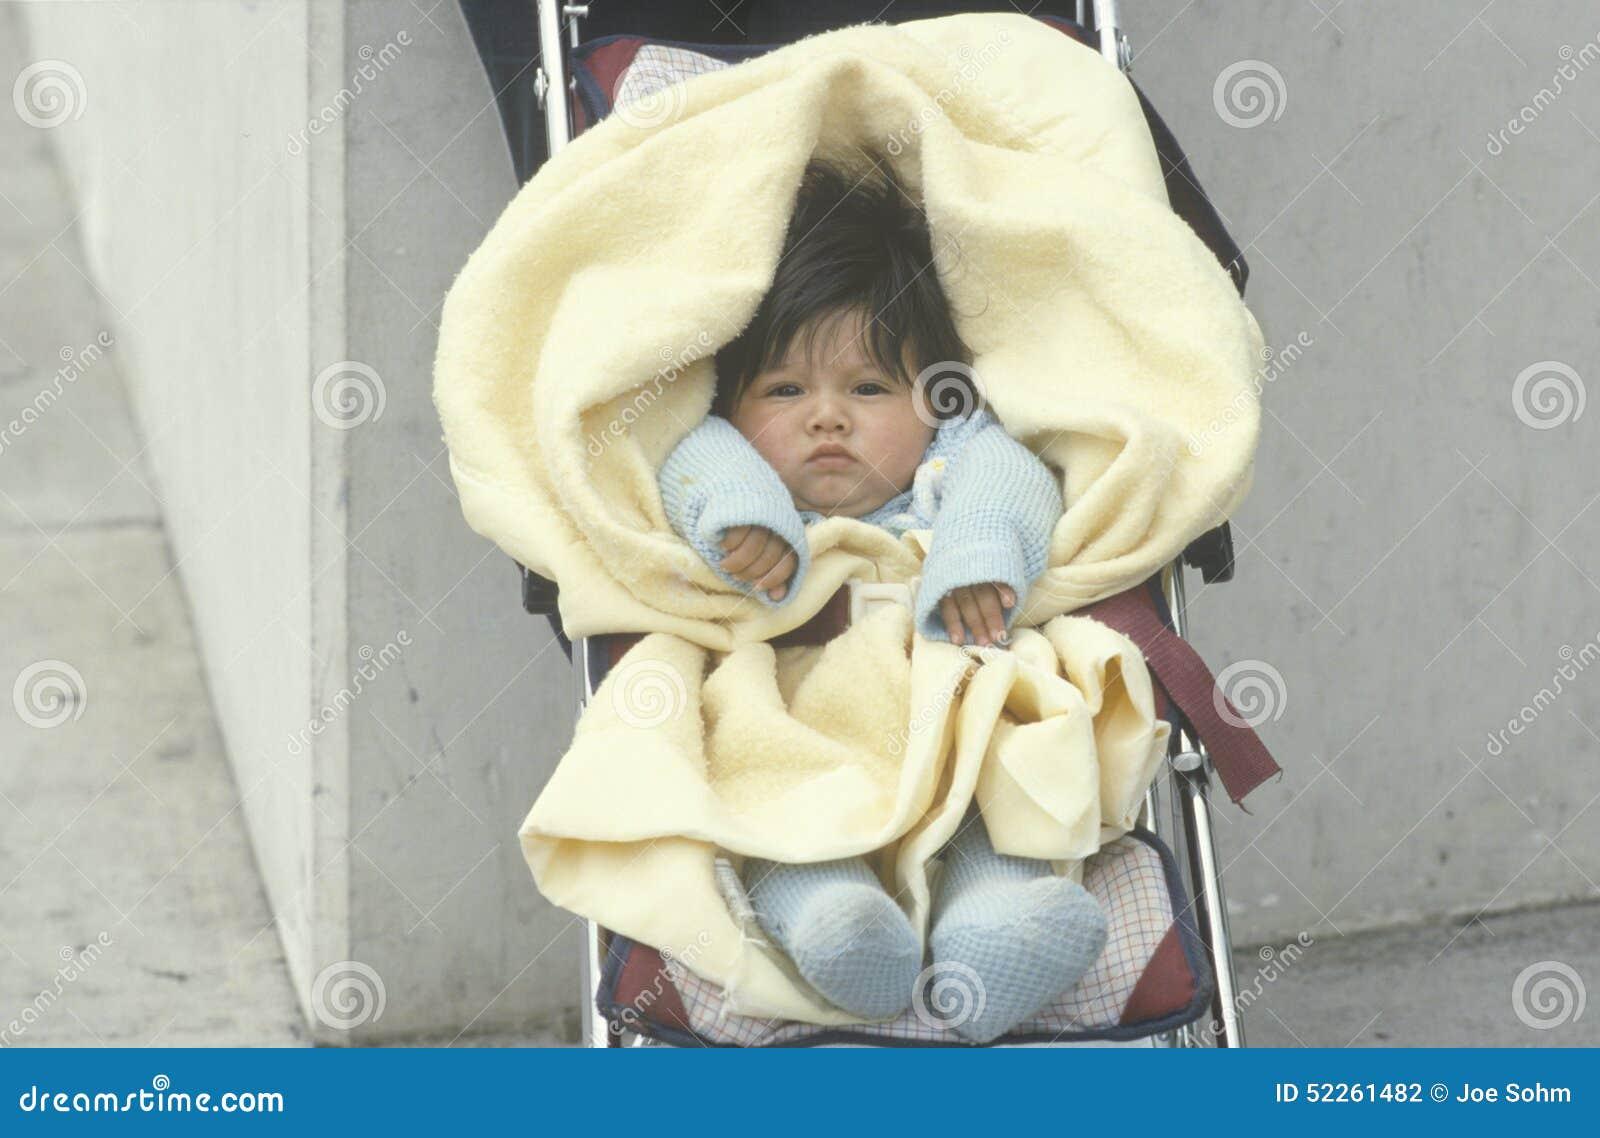 A Baby In A Stroller Los Angeles Ca Editorial